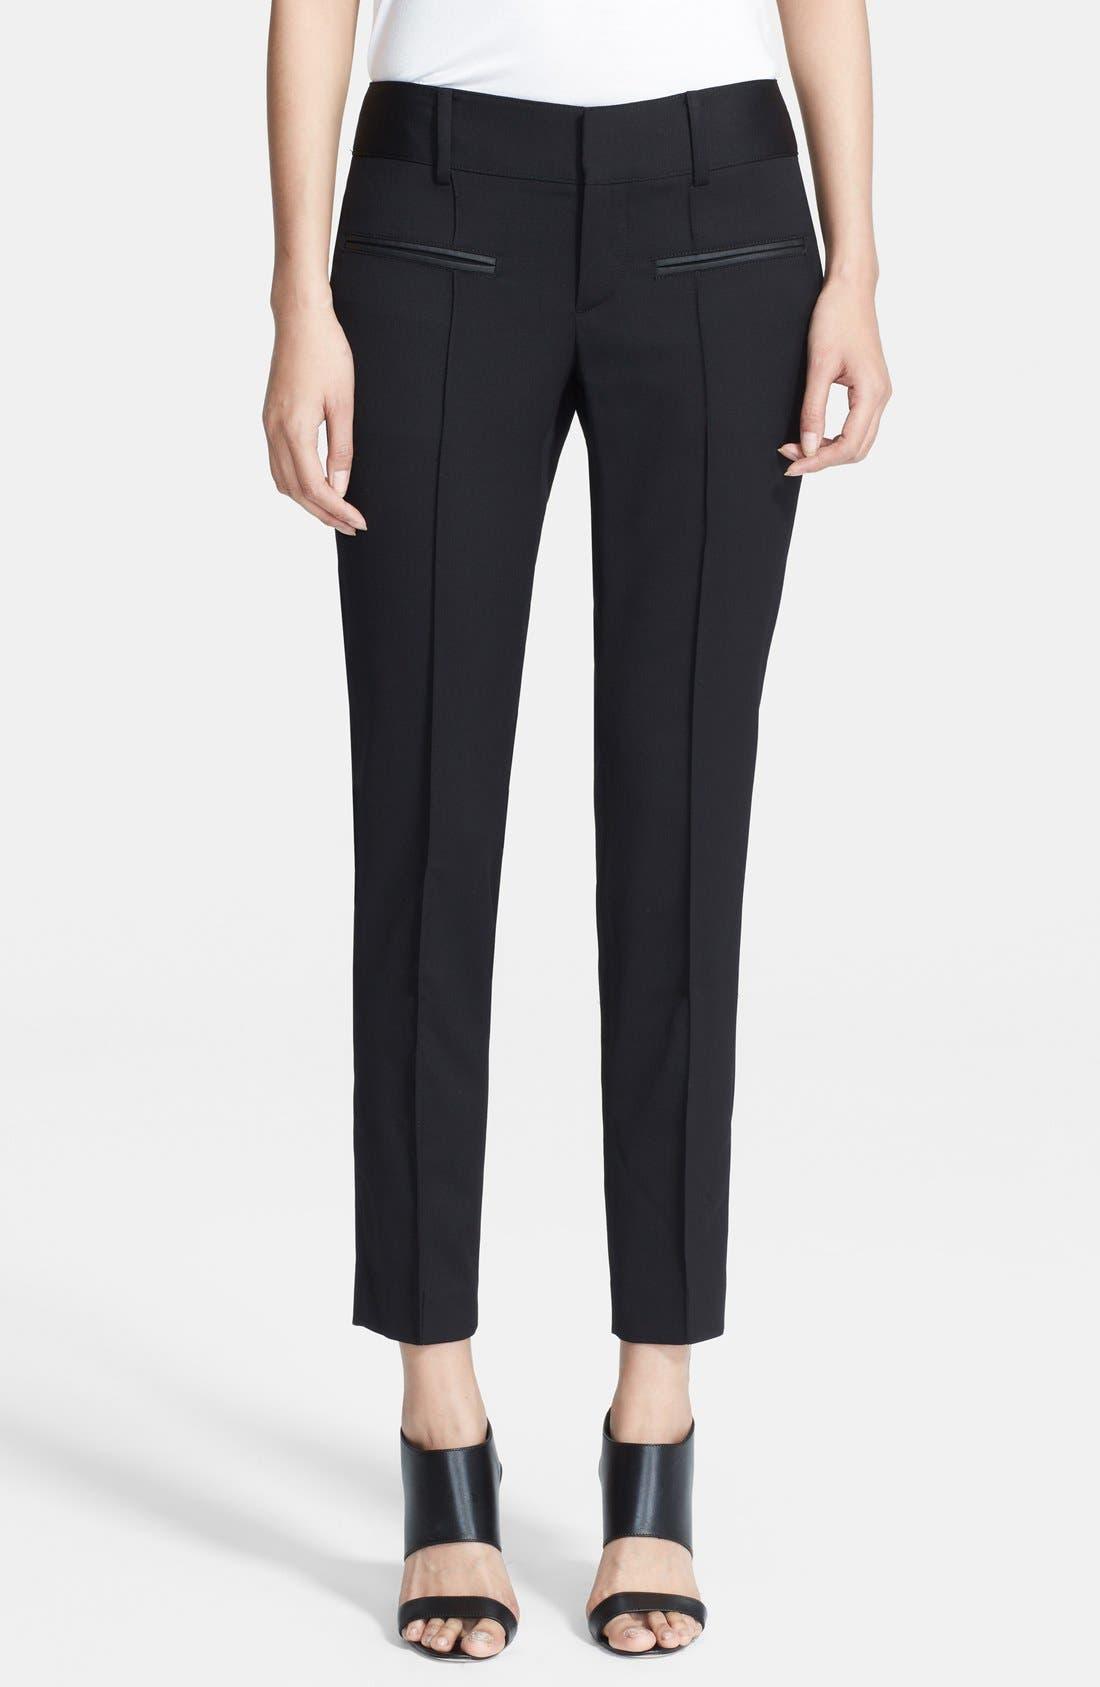 HELMUT LANG, Stretch Wool Ankle Pants, Main thumbnail 1, color, BLACK